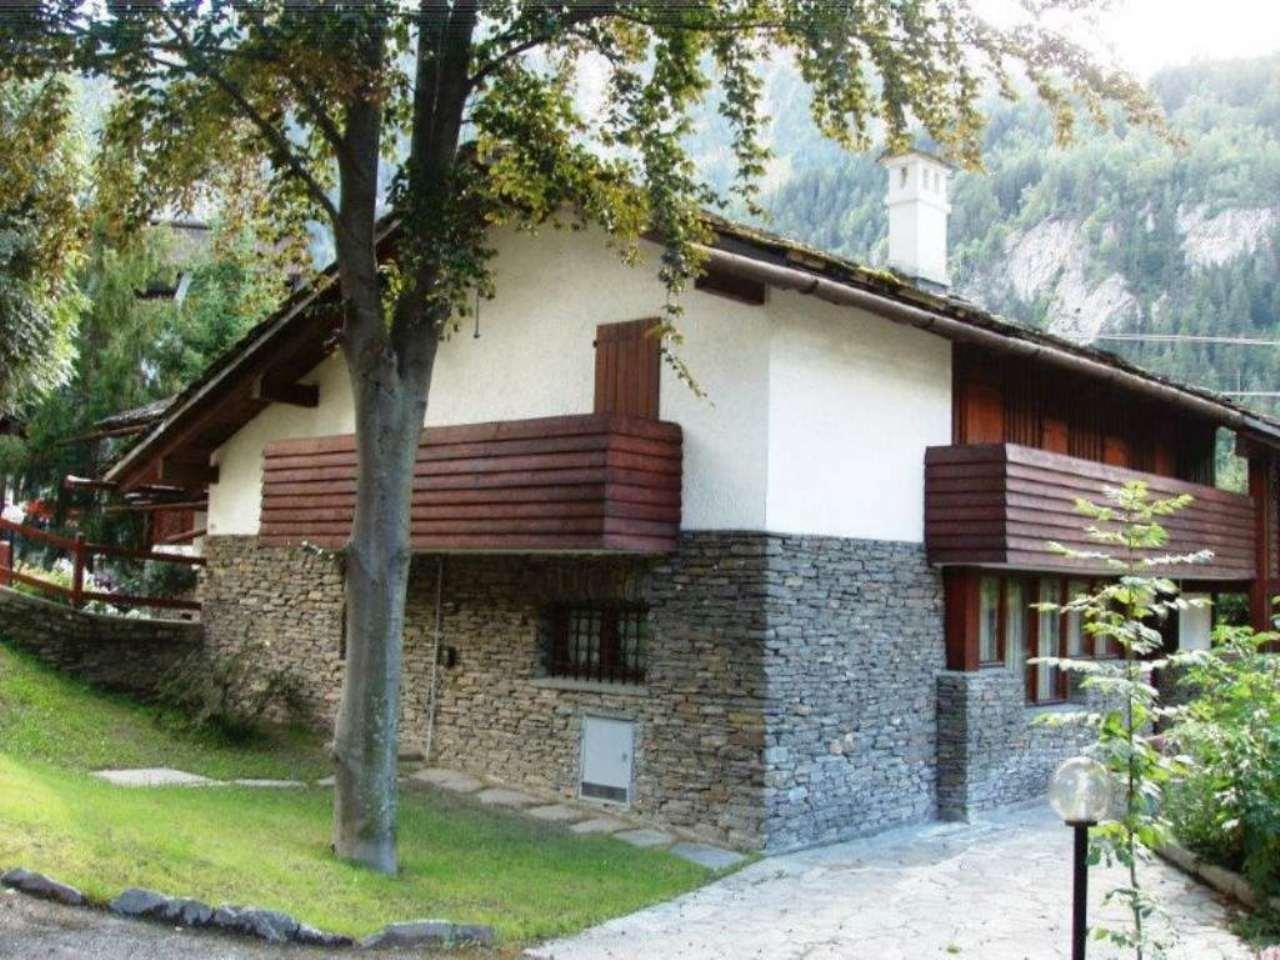 Villa in Vendita a Courmayeur: 5 locali, 450 mq - Foto 4